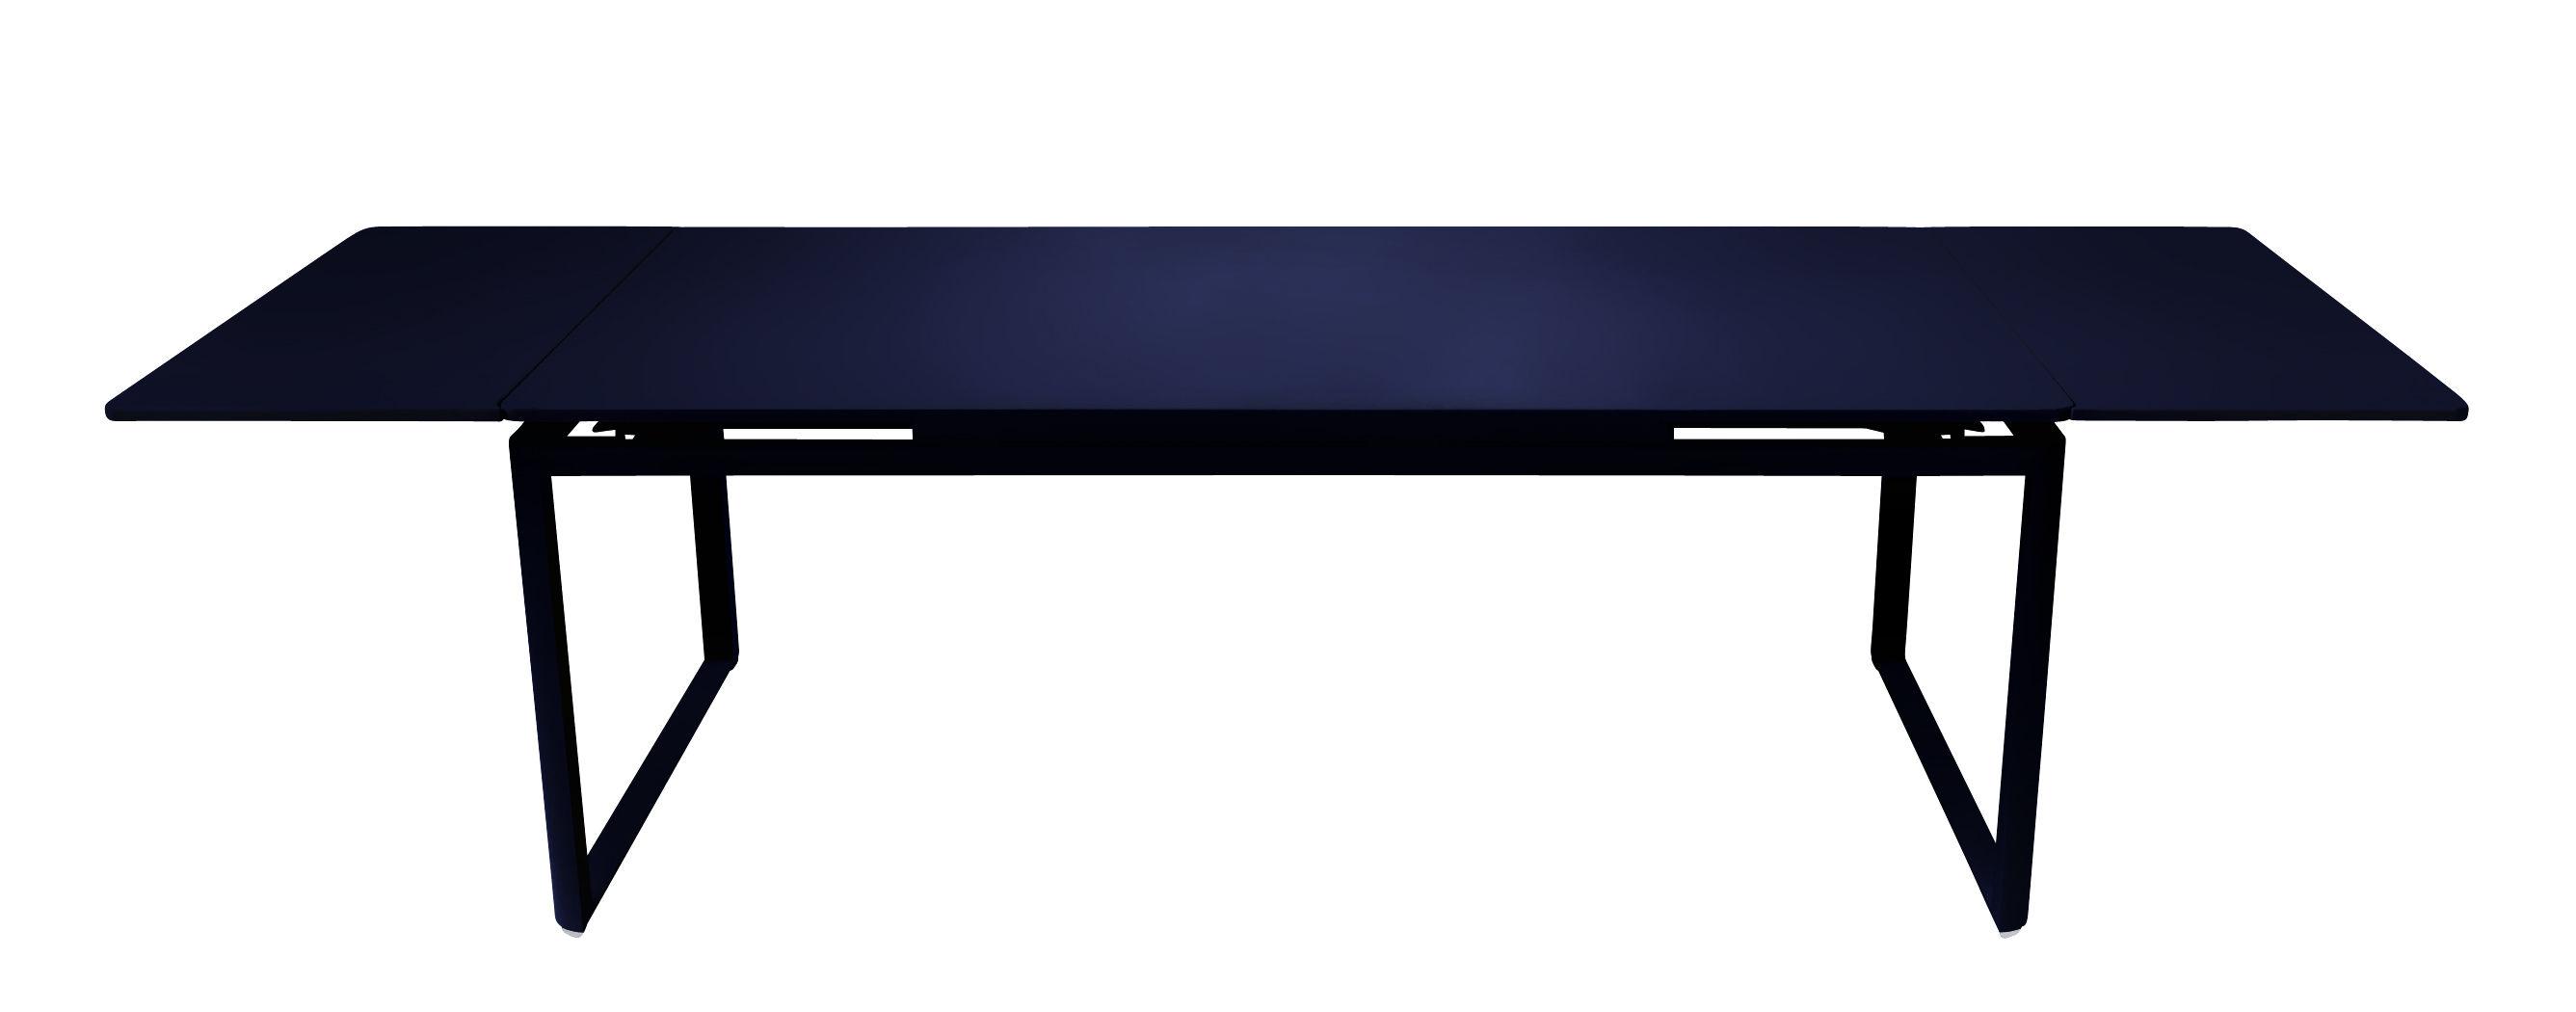 Outdoor - Tables de jardin - Table à rallonge Biarritz / L 200 à 300 cm - Fermob - Bleu abysse - Acier laqué, Aluminium laqué